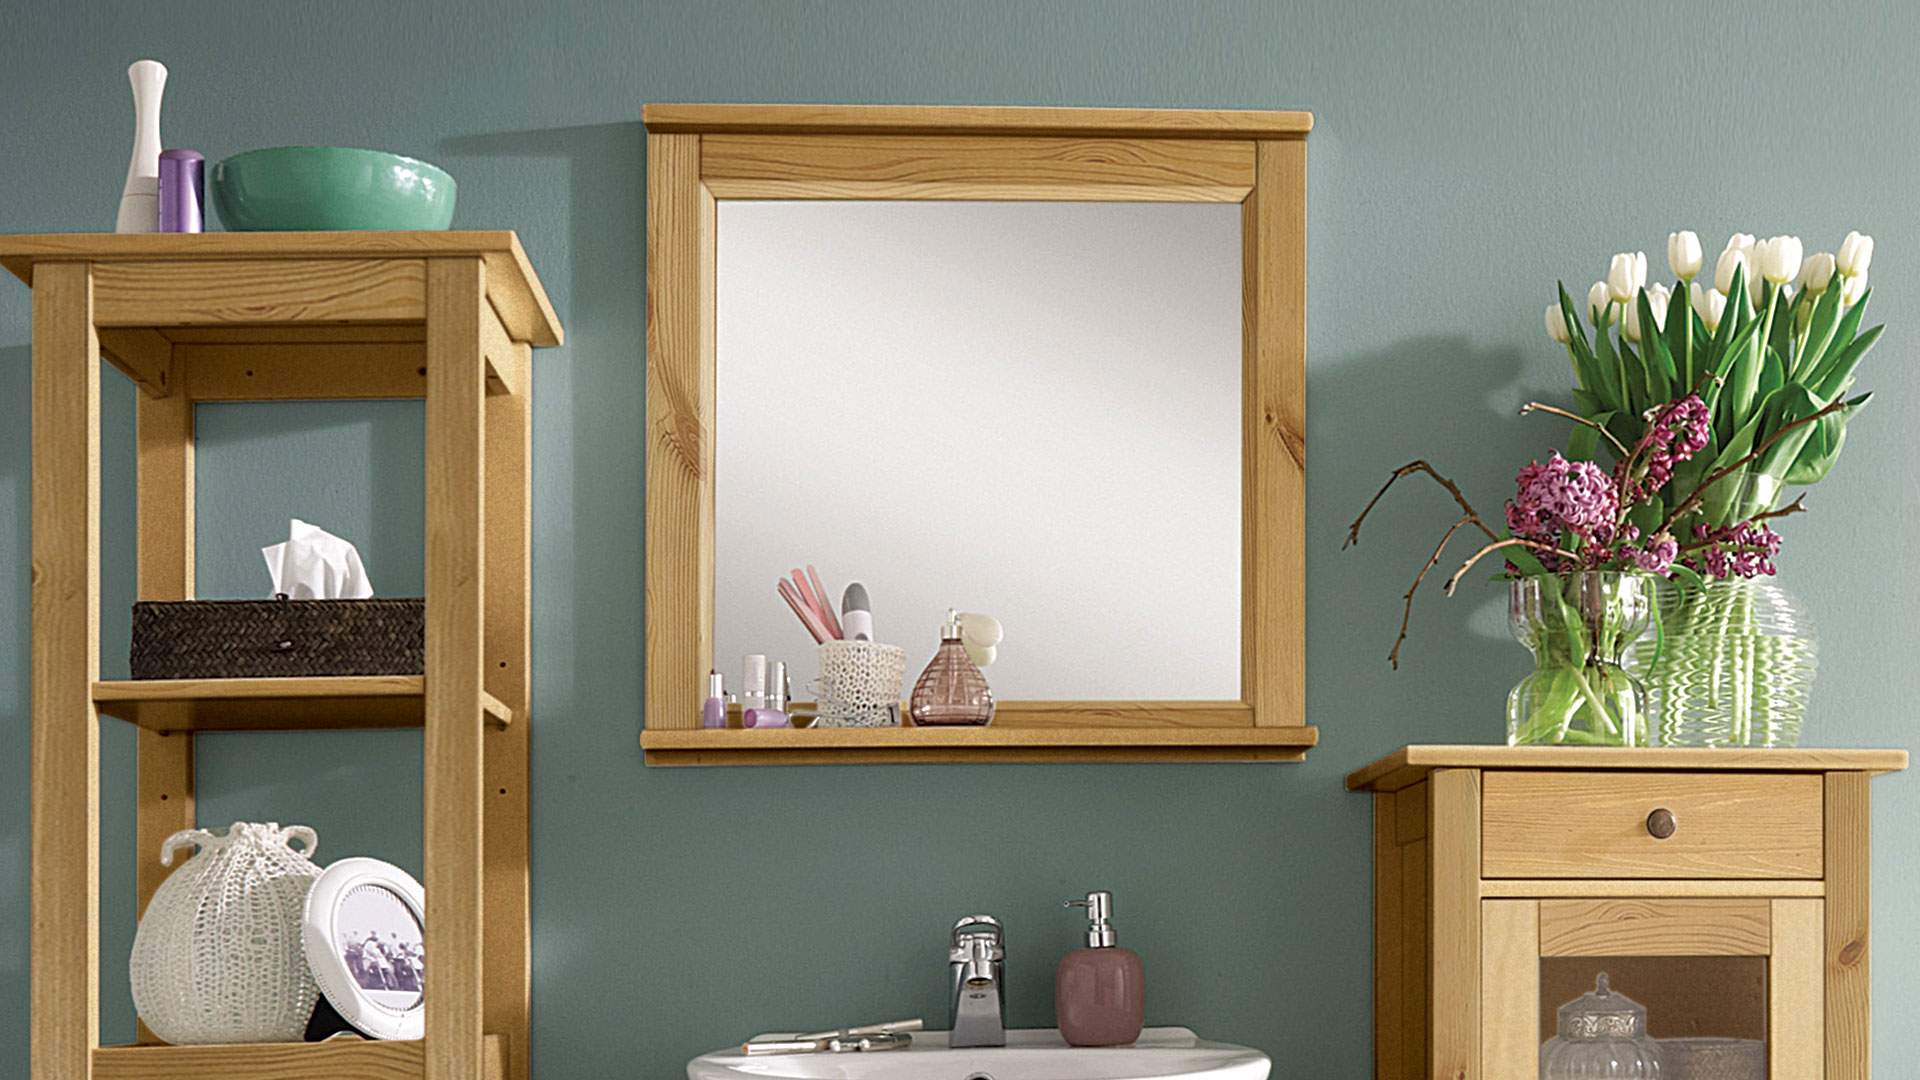 Spiegel aus Kiefernholz gelaugt geölt Badspiegel